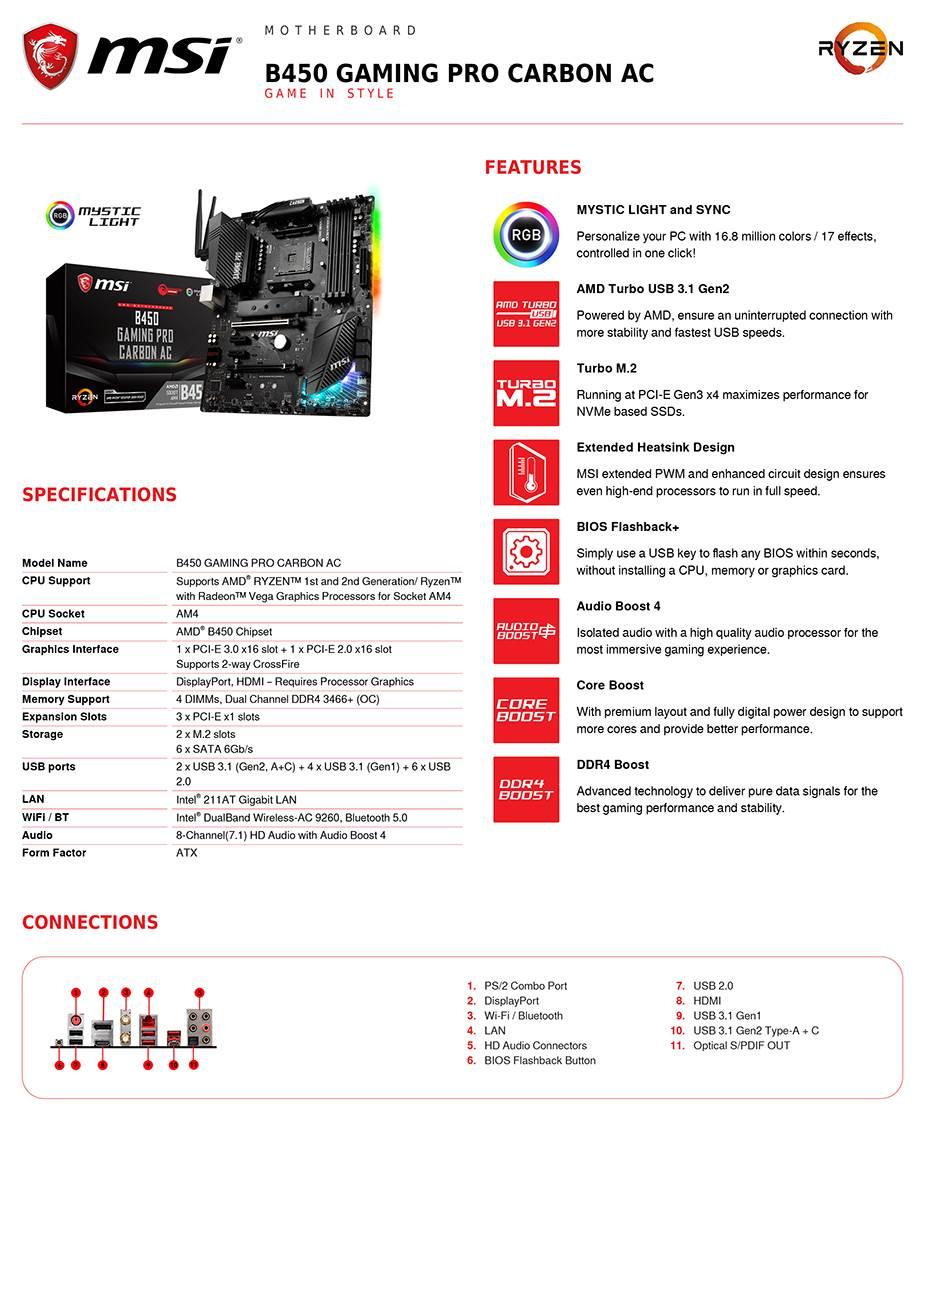 MSI B450 GAMING PRO CARBON AC AM4 ATX Motherboard - B450 GAMING PRO